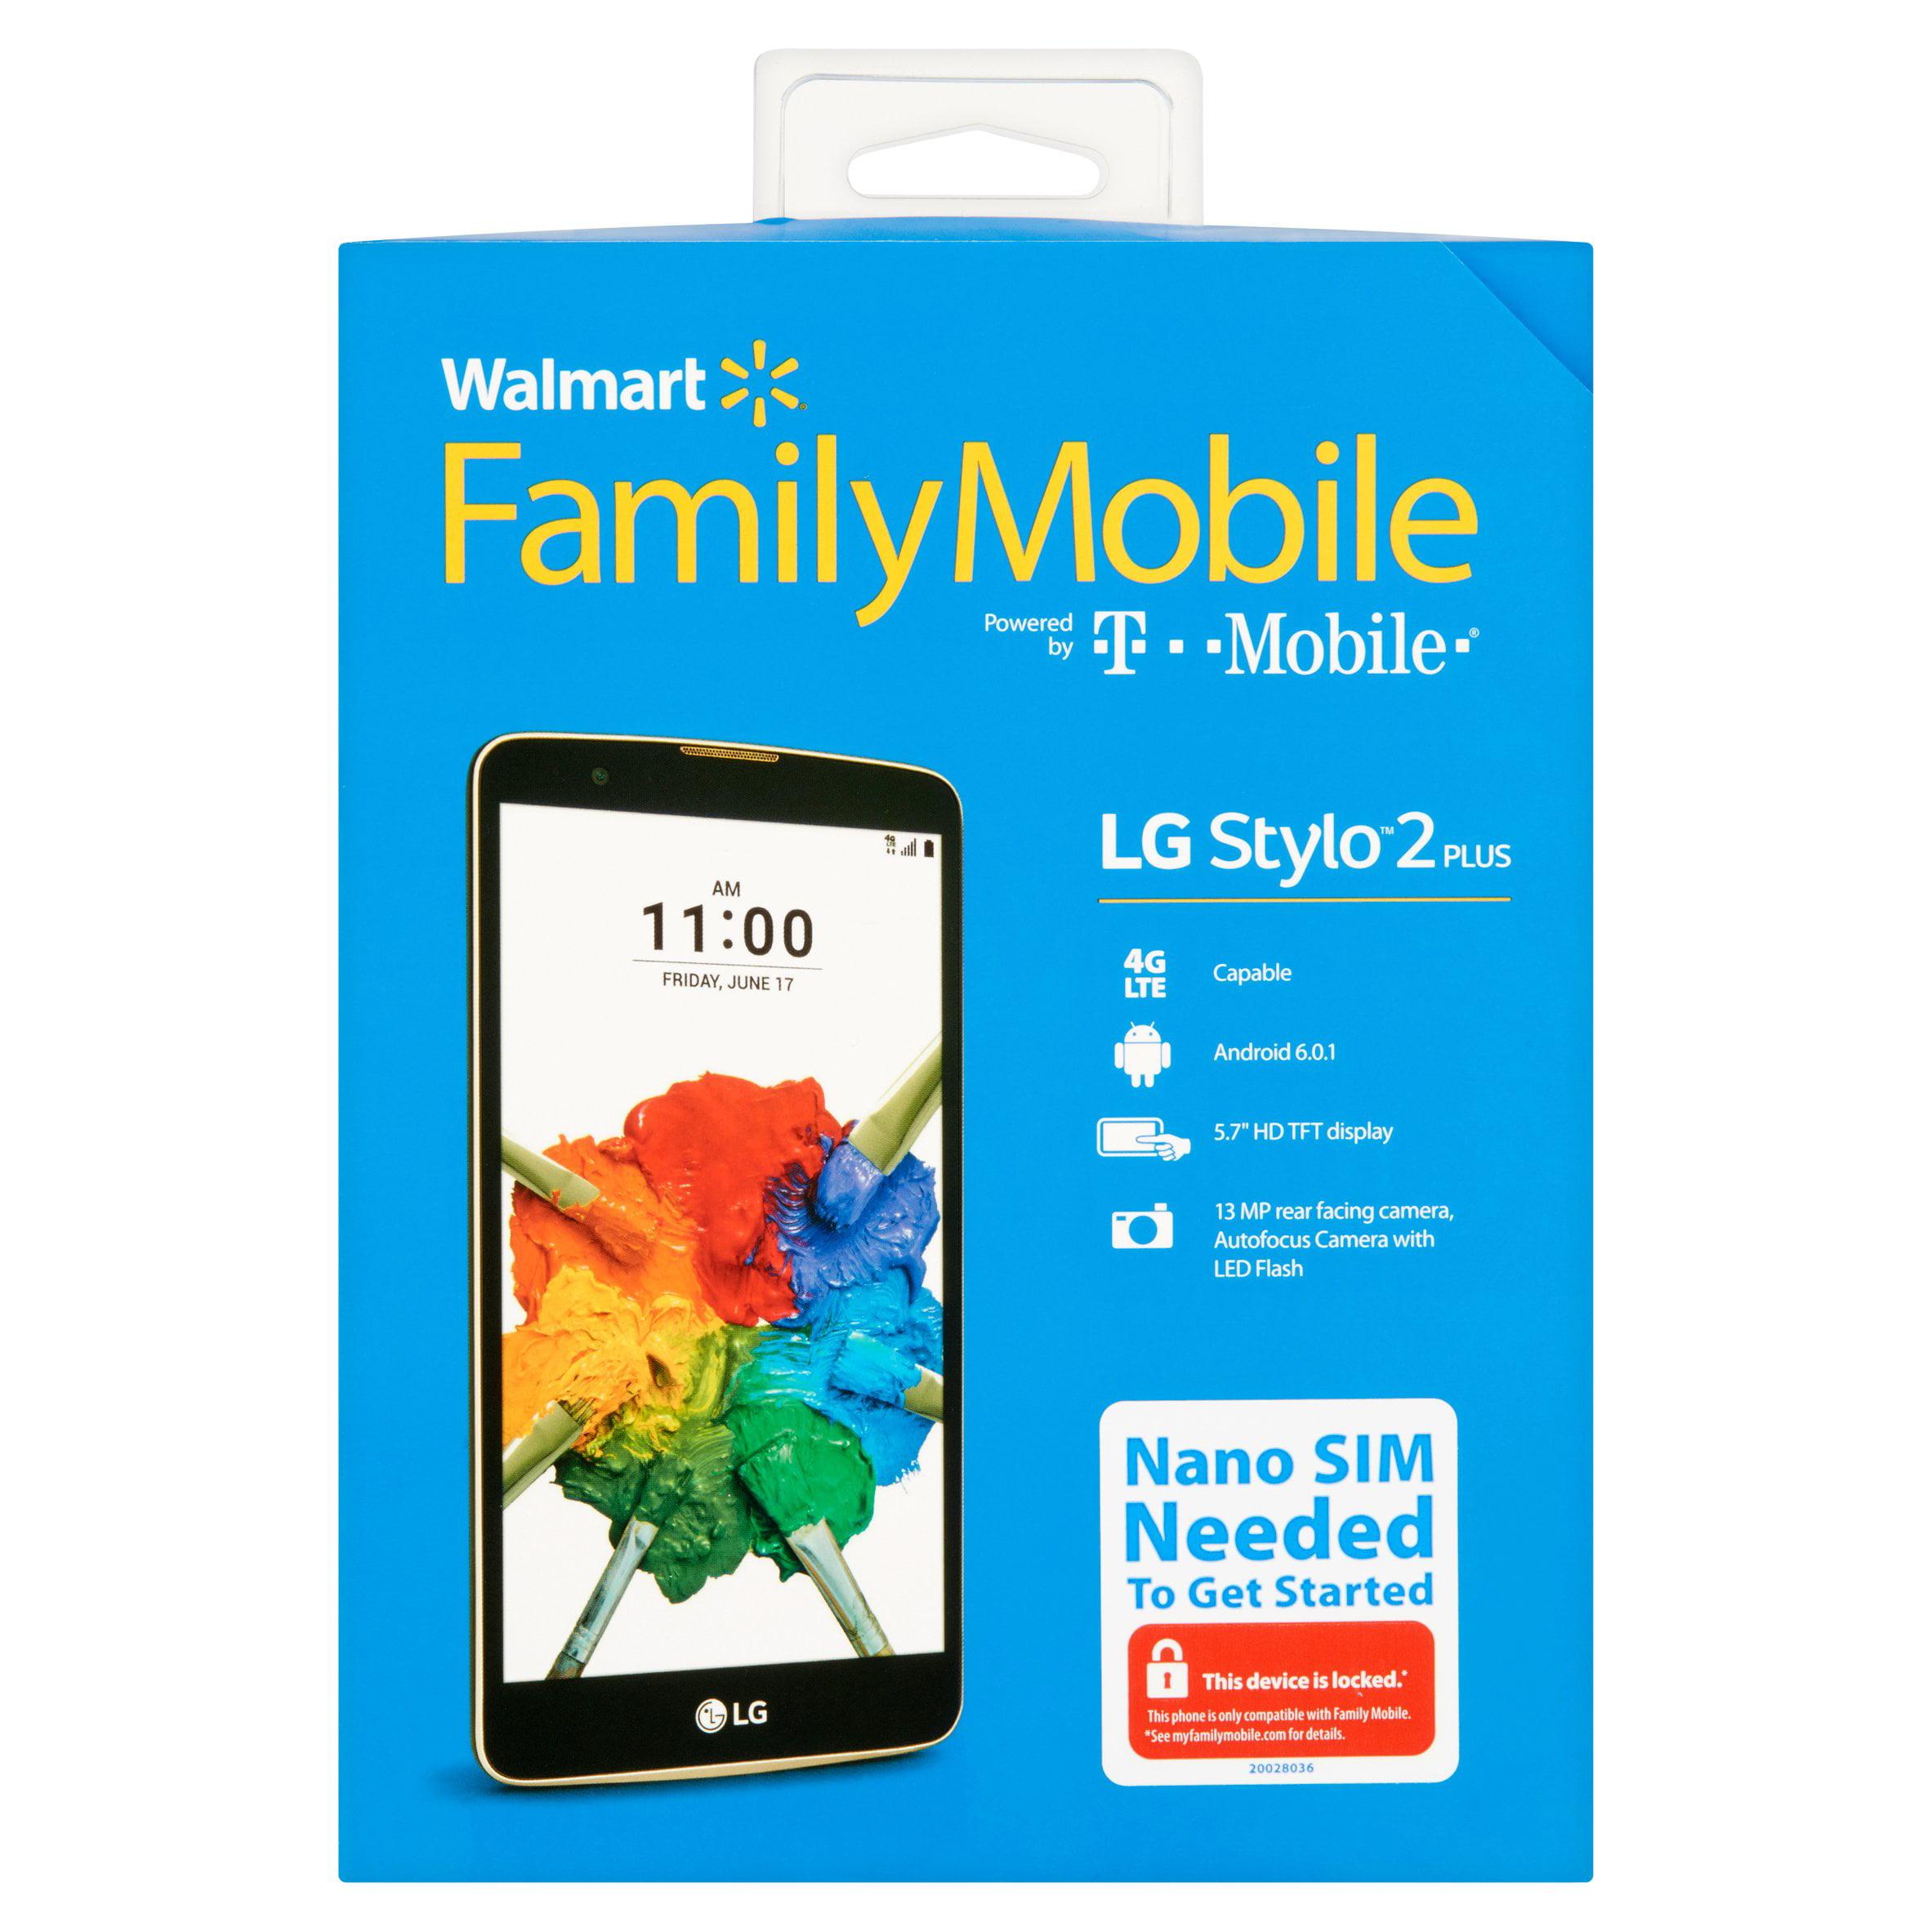 Walmart Family Mobile LG Stylo 2 16GB Prepaid Smartphone, Black